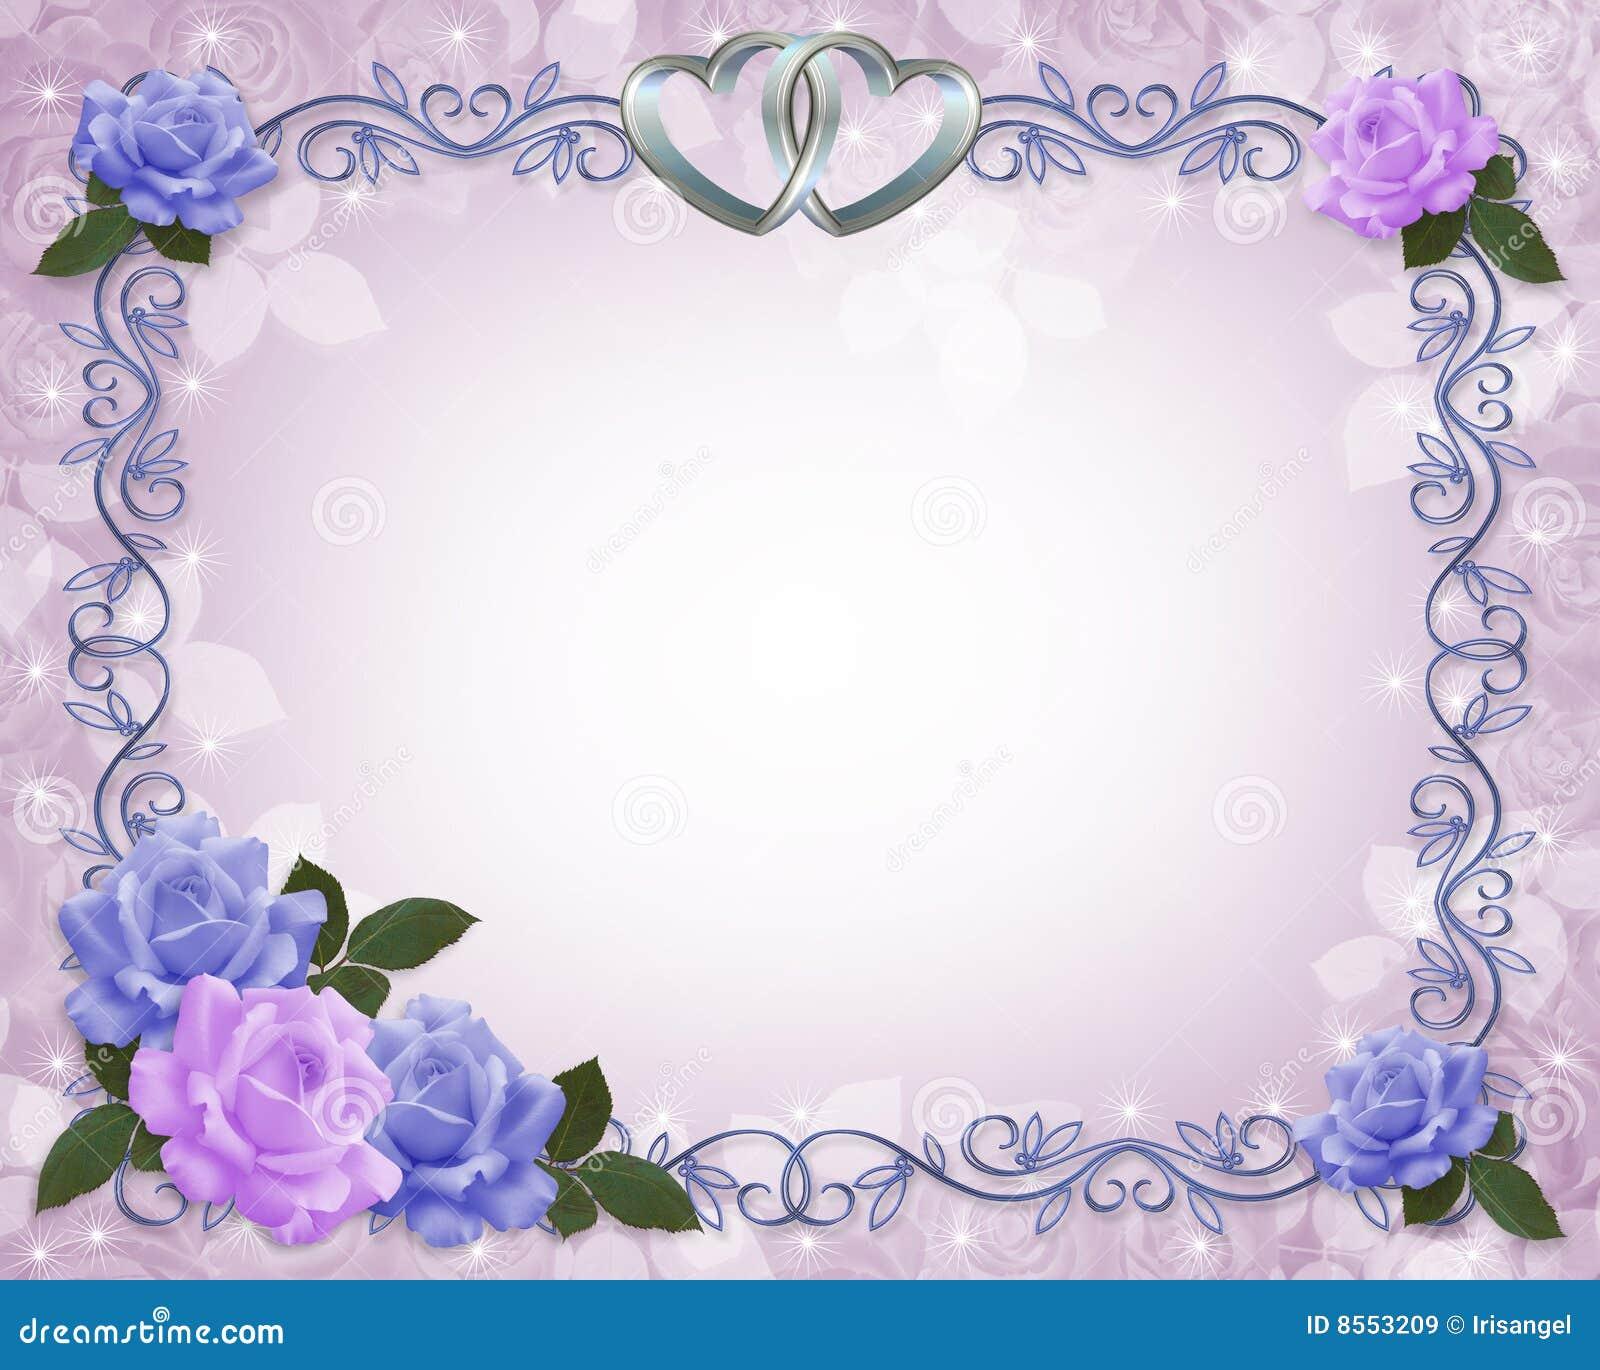 Wedding Invitation Border Lavender Roses Stock Illustration ...